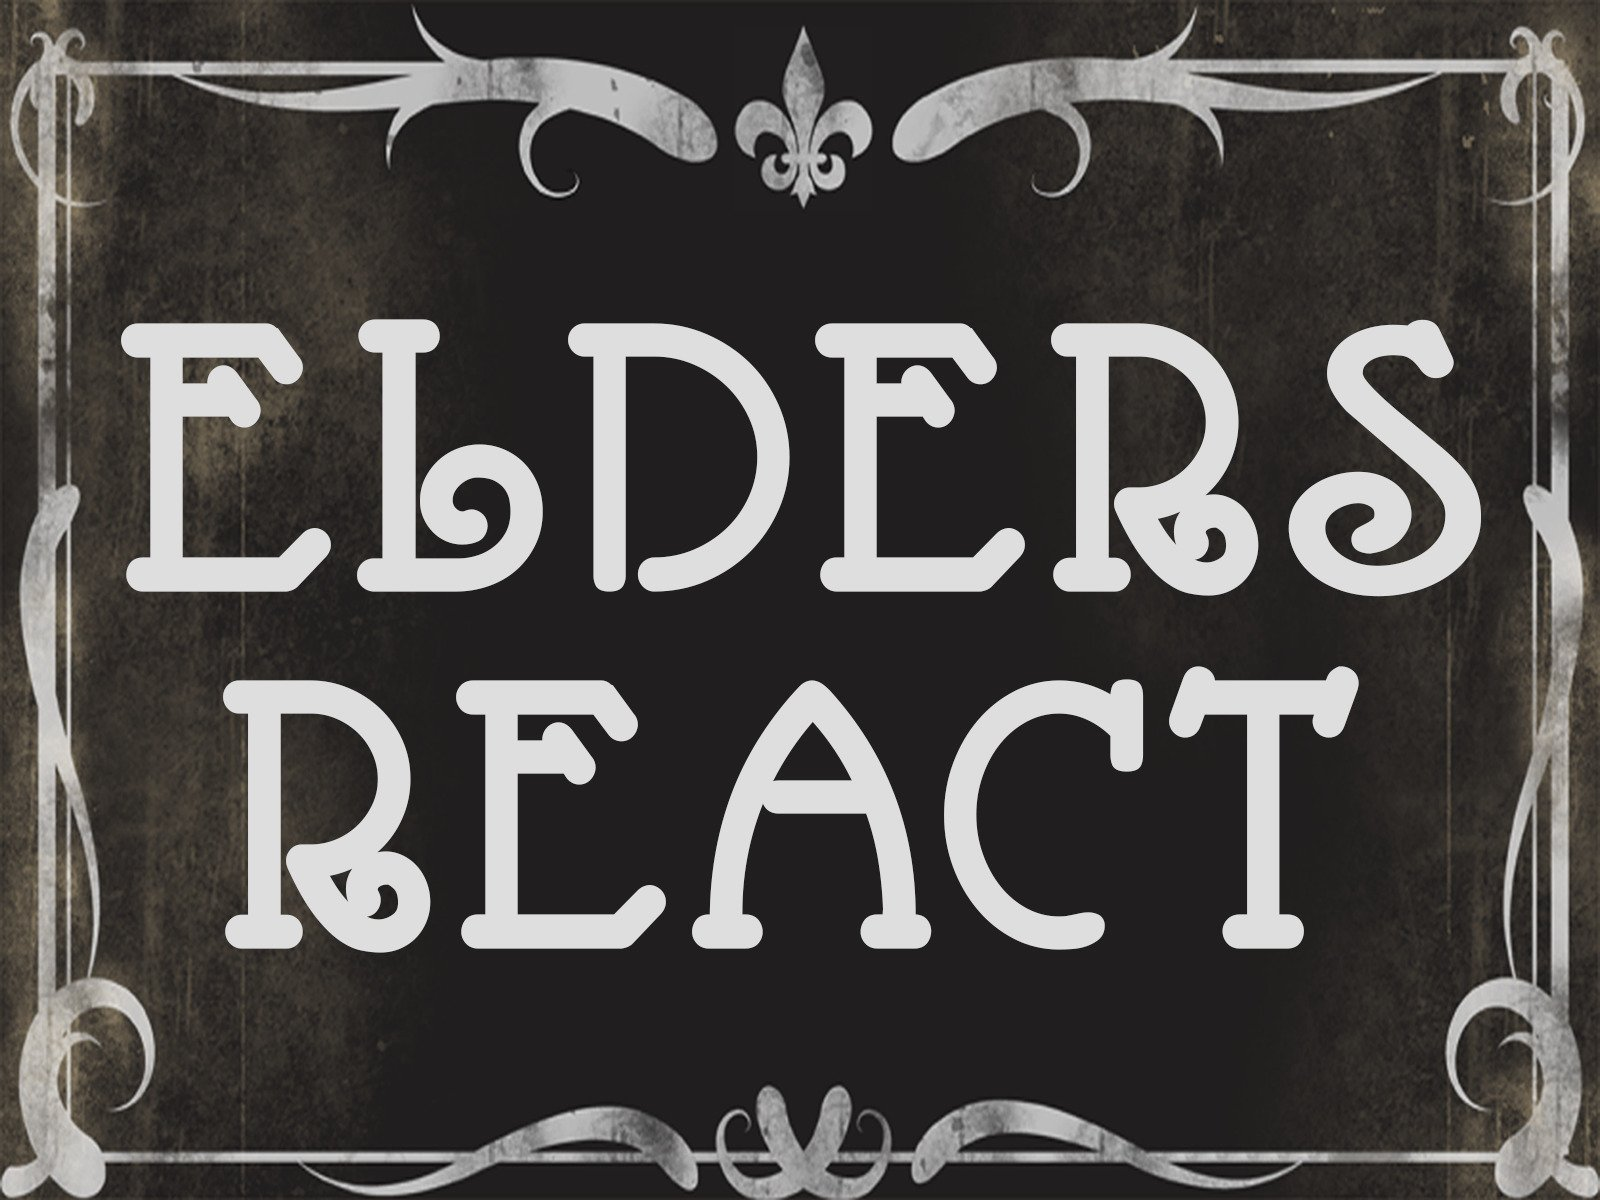 Elders React on Amazon Prime Video UK